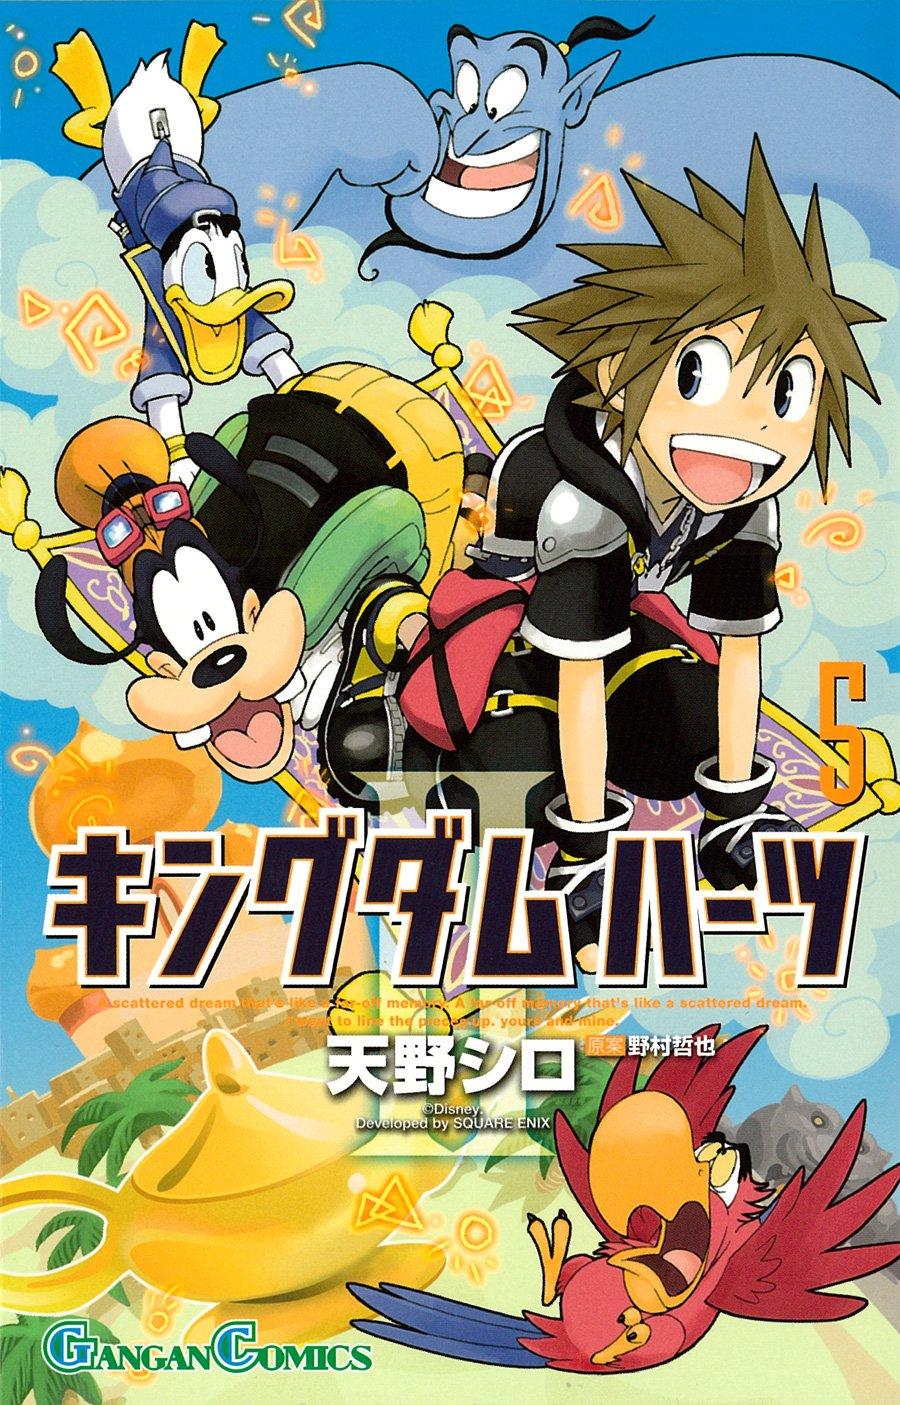 Kingdom Hearts II - Vol 5 (Gangan Comics) Manga: Square Enix